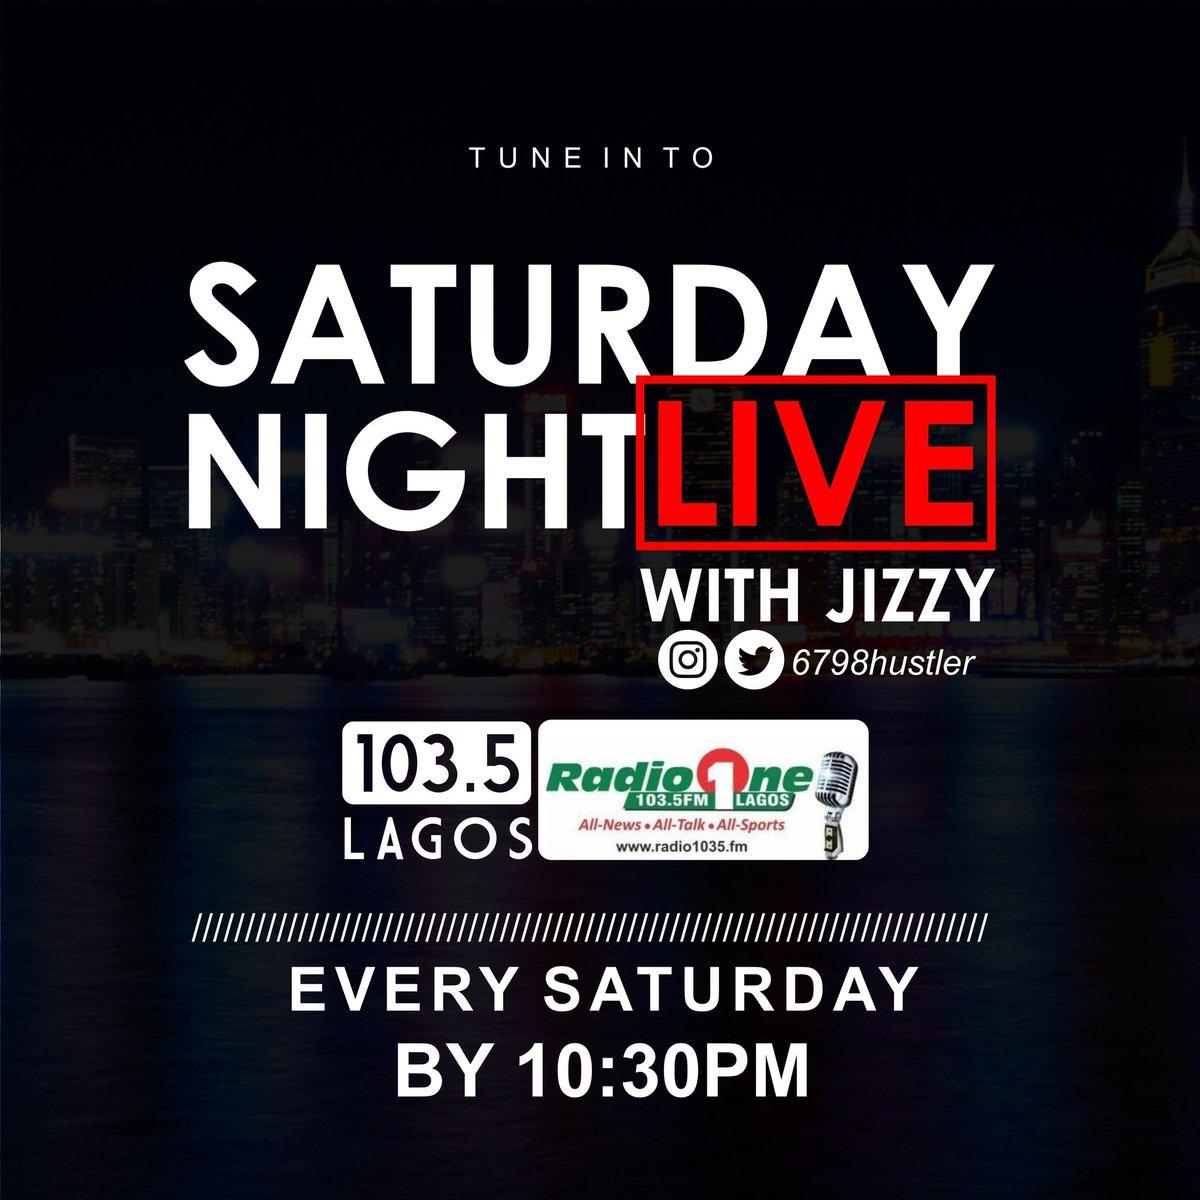 #NowPlayingonRadio1 Afuruginaya - @blazingfirebm  #SaturdayNightLive with @Nedujizzy1   #Tuneinnow 📻🎼🎤🎶🎙🎚🎼🎵 #Goodvibesonly #SNL  Listen to us live on http://radio1035.FM